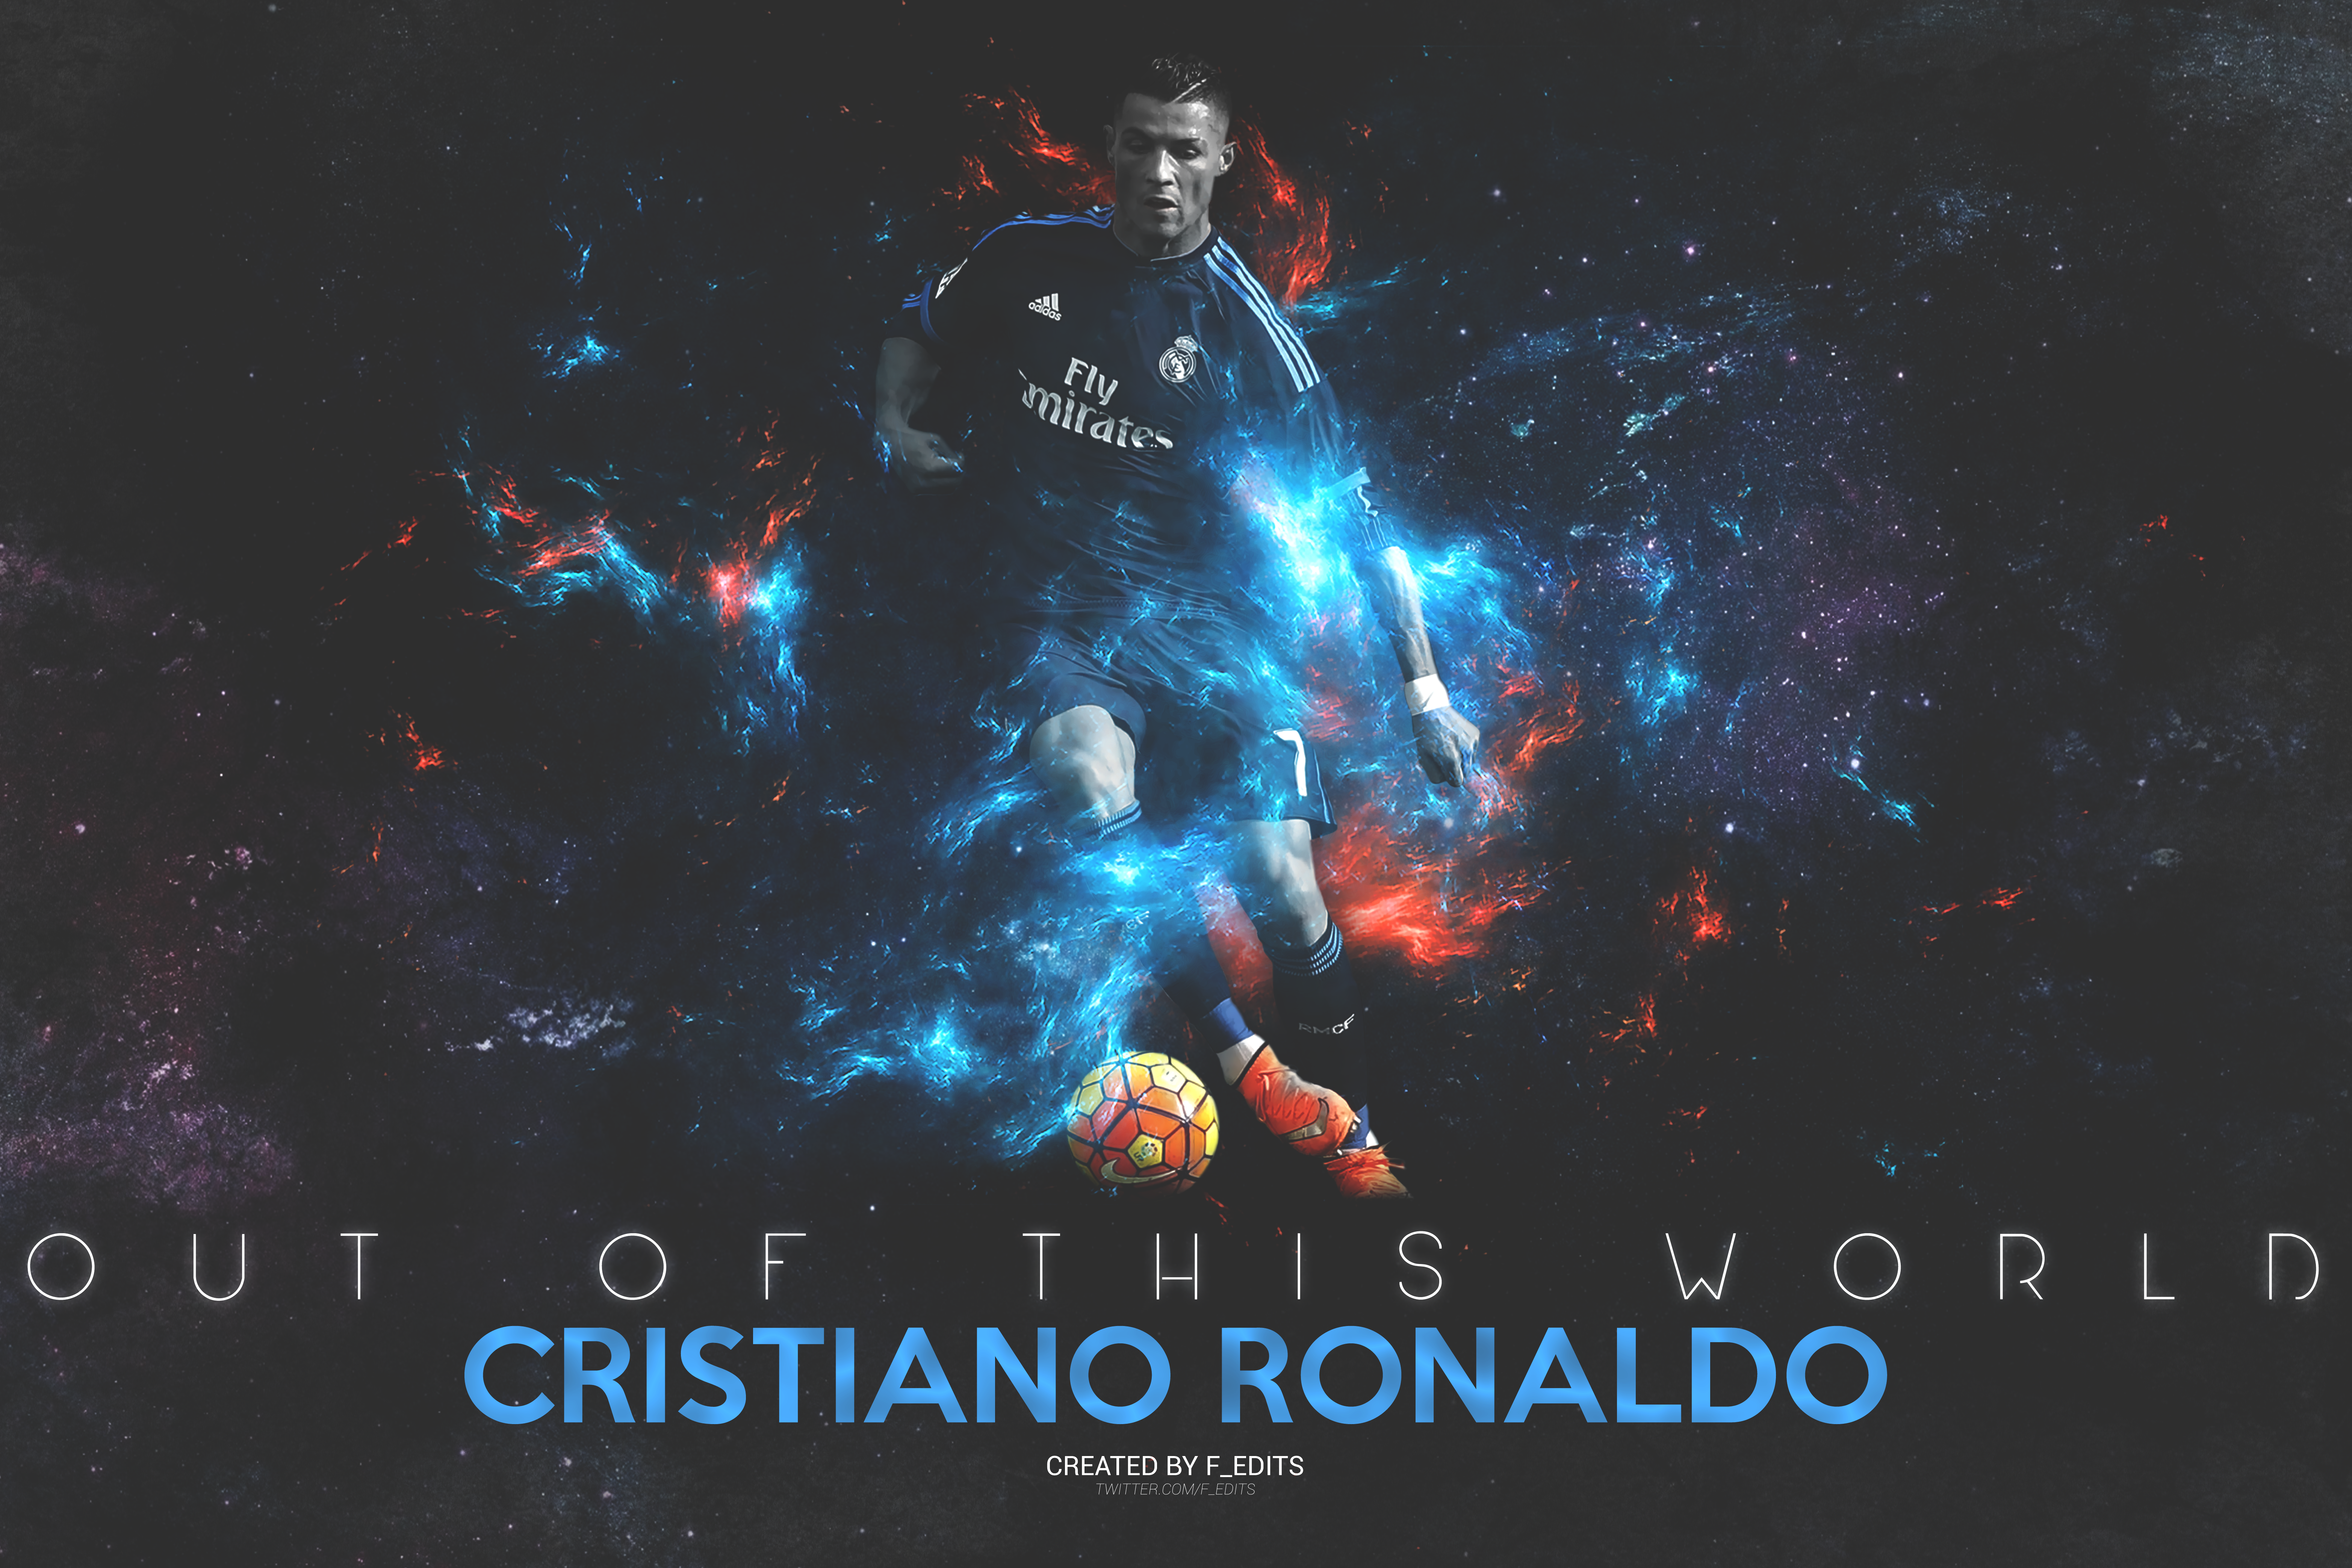 cristiano ronaldo desktop wallpaperf-edits on deviantart